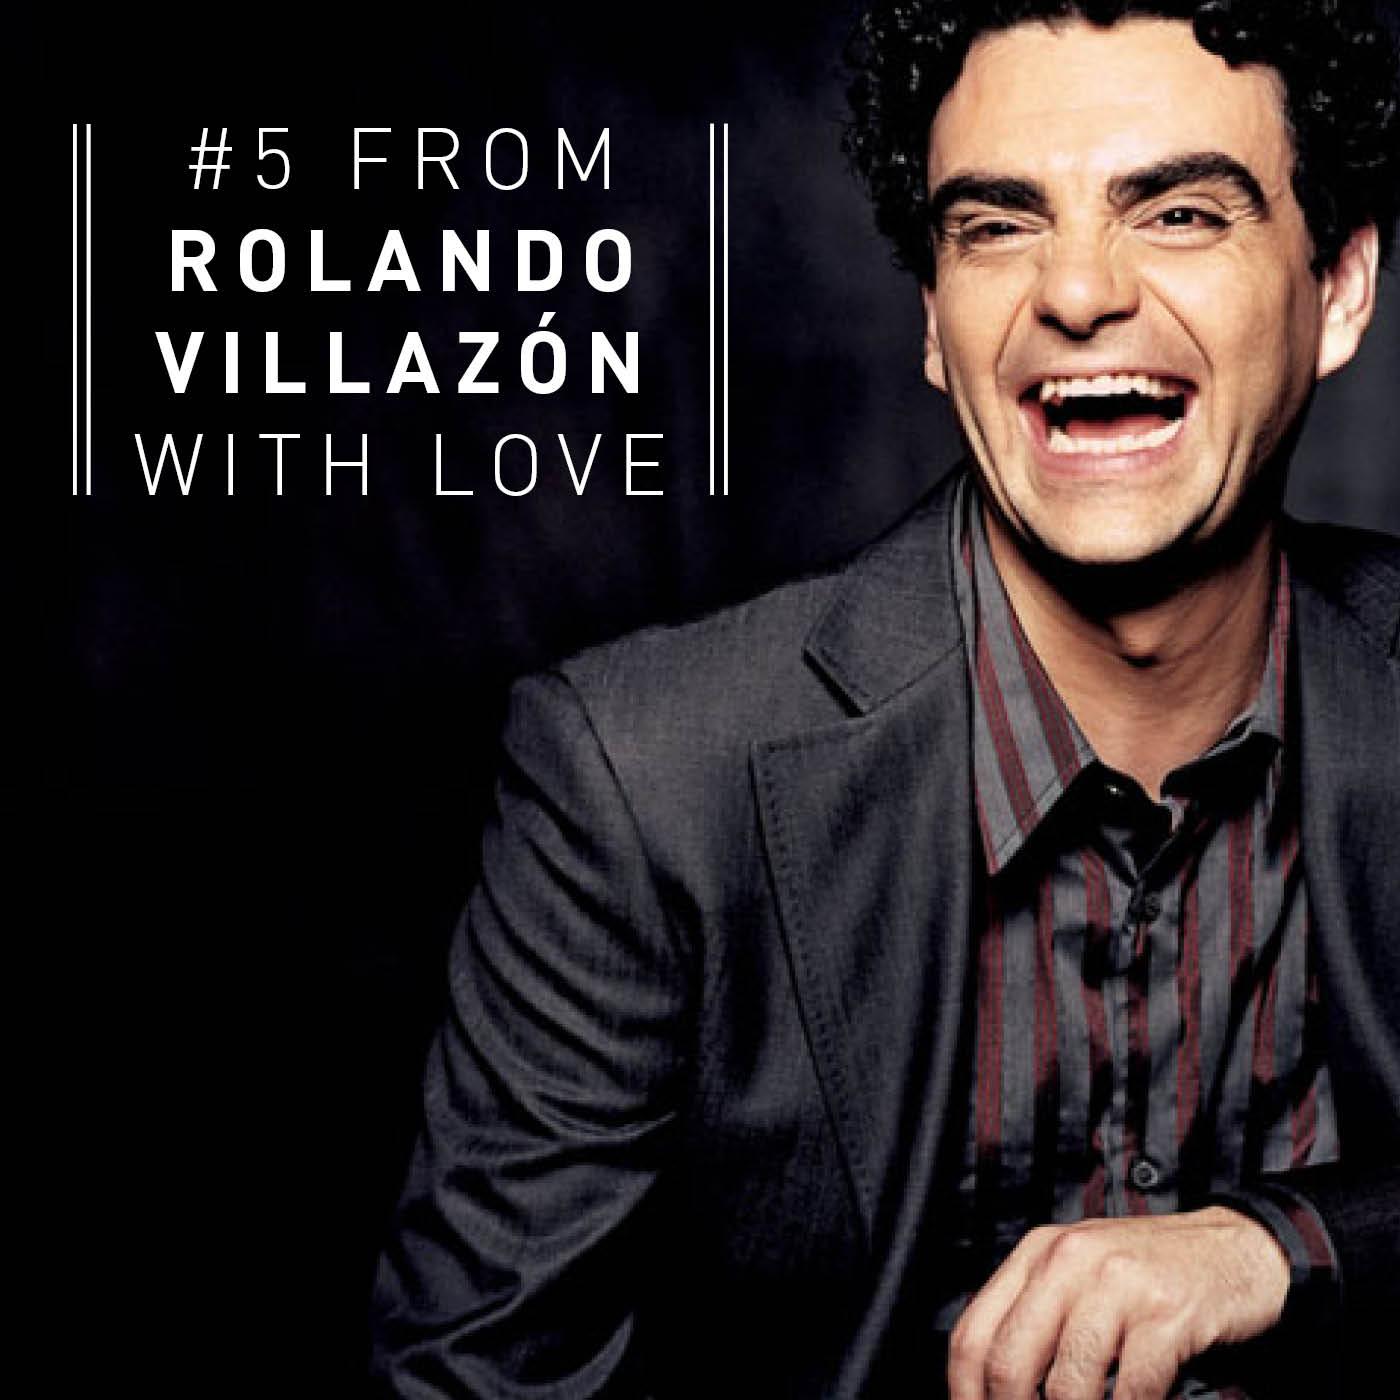 #5 From Rolando Villazón With Love